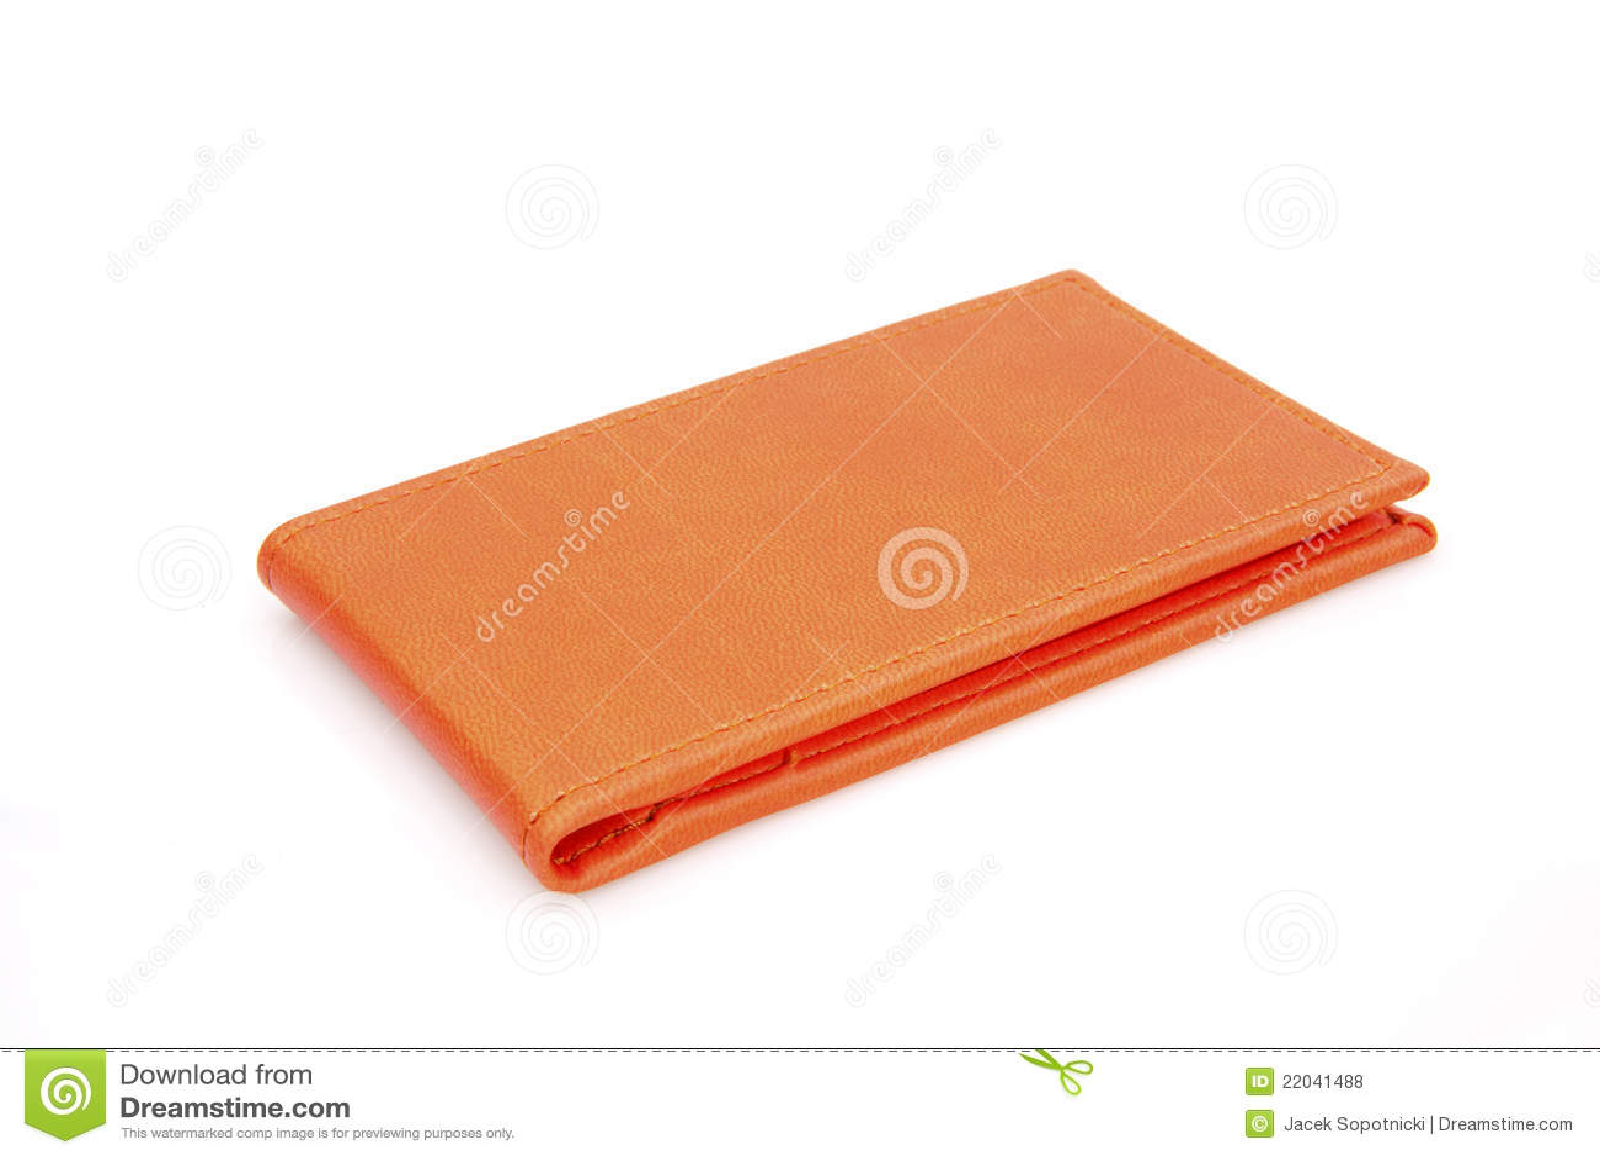 Orange business card holder royalty free stock photos for Orange business card holder